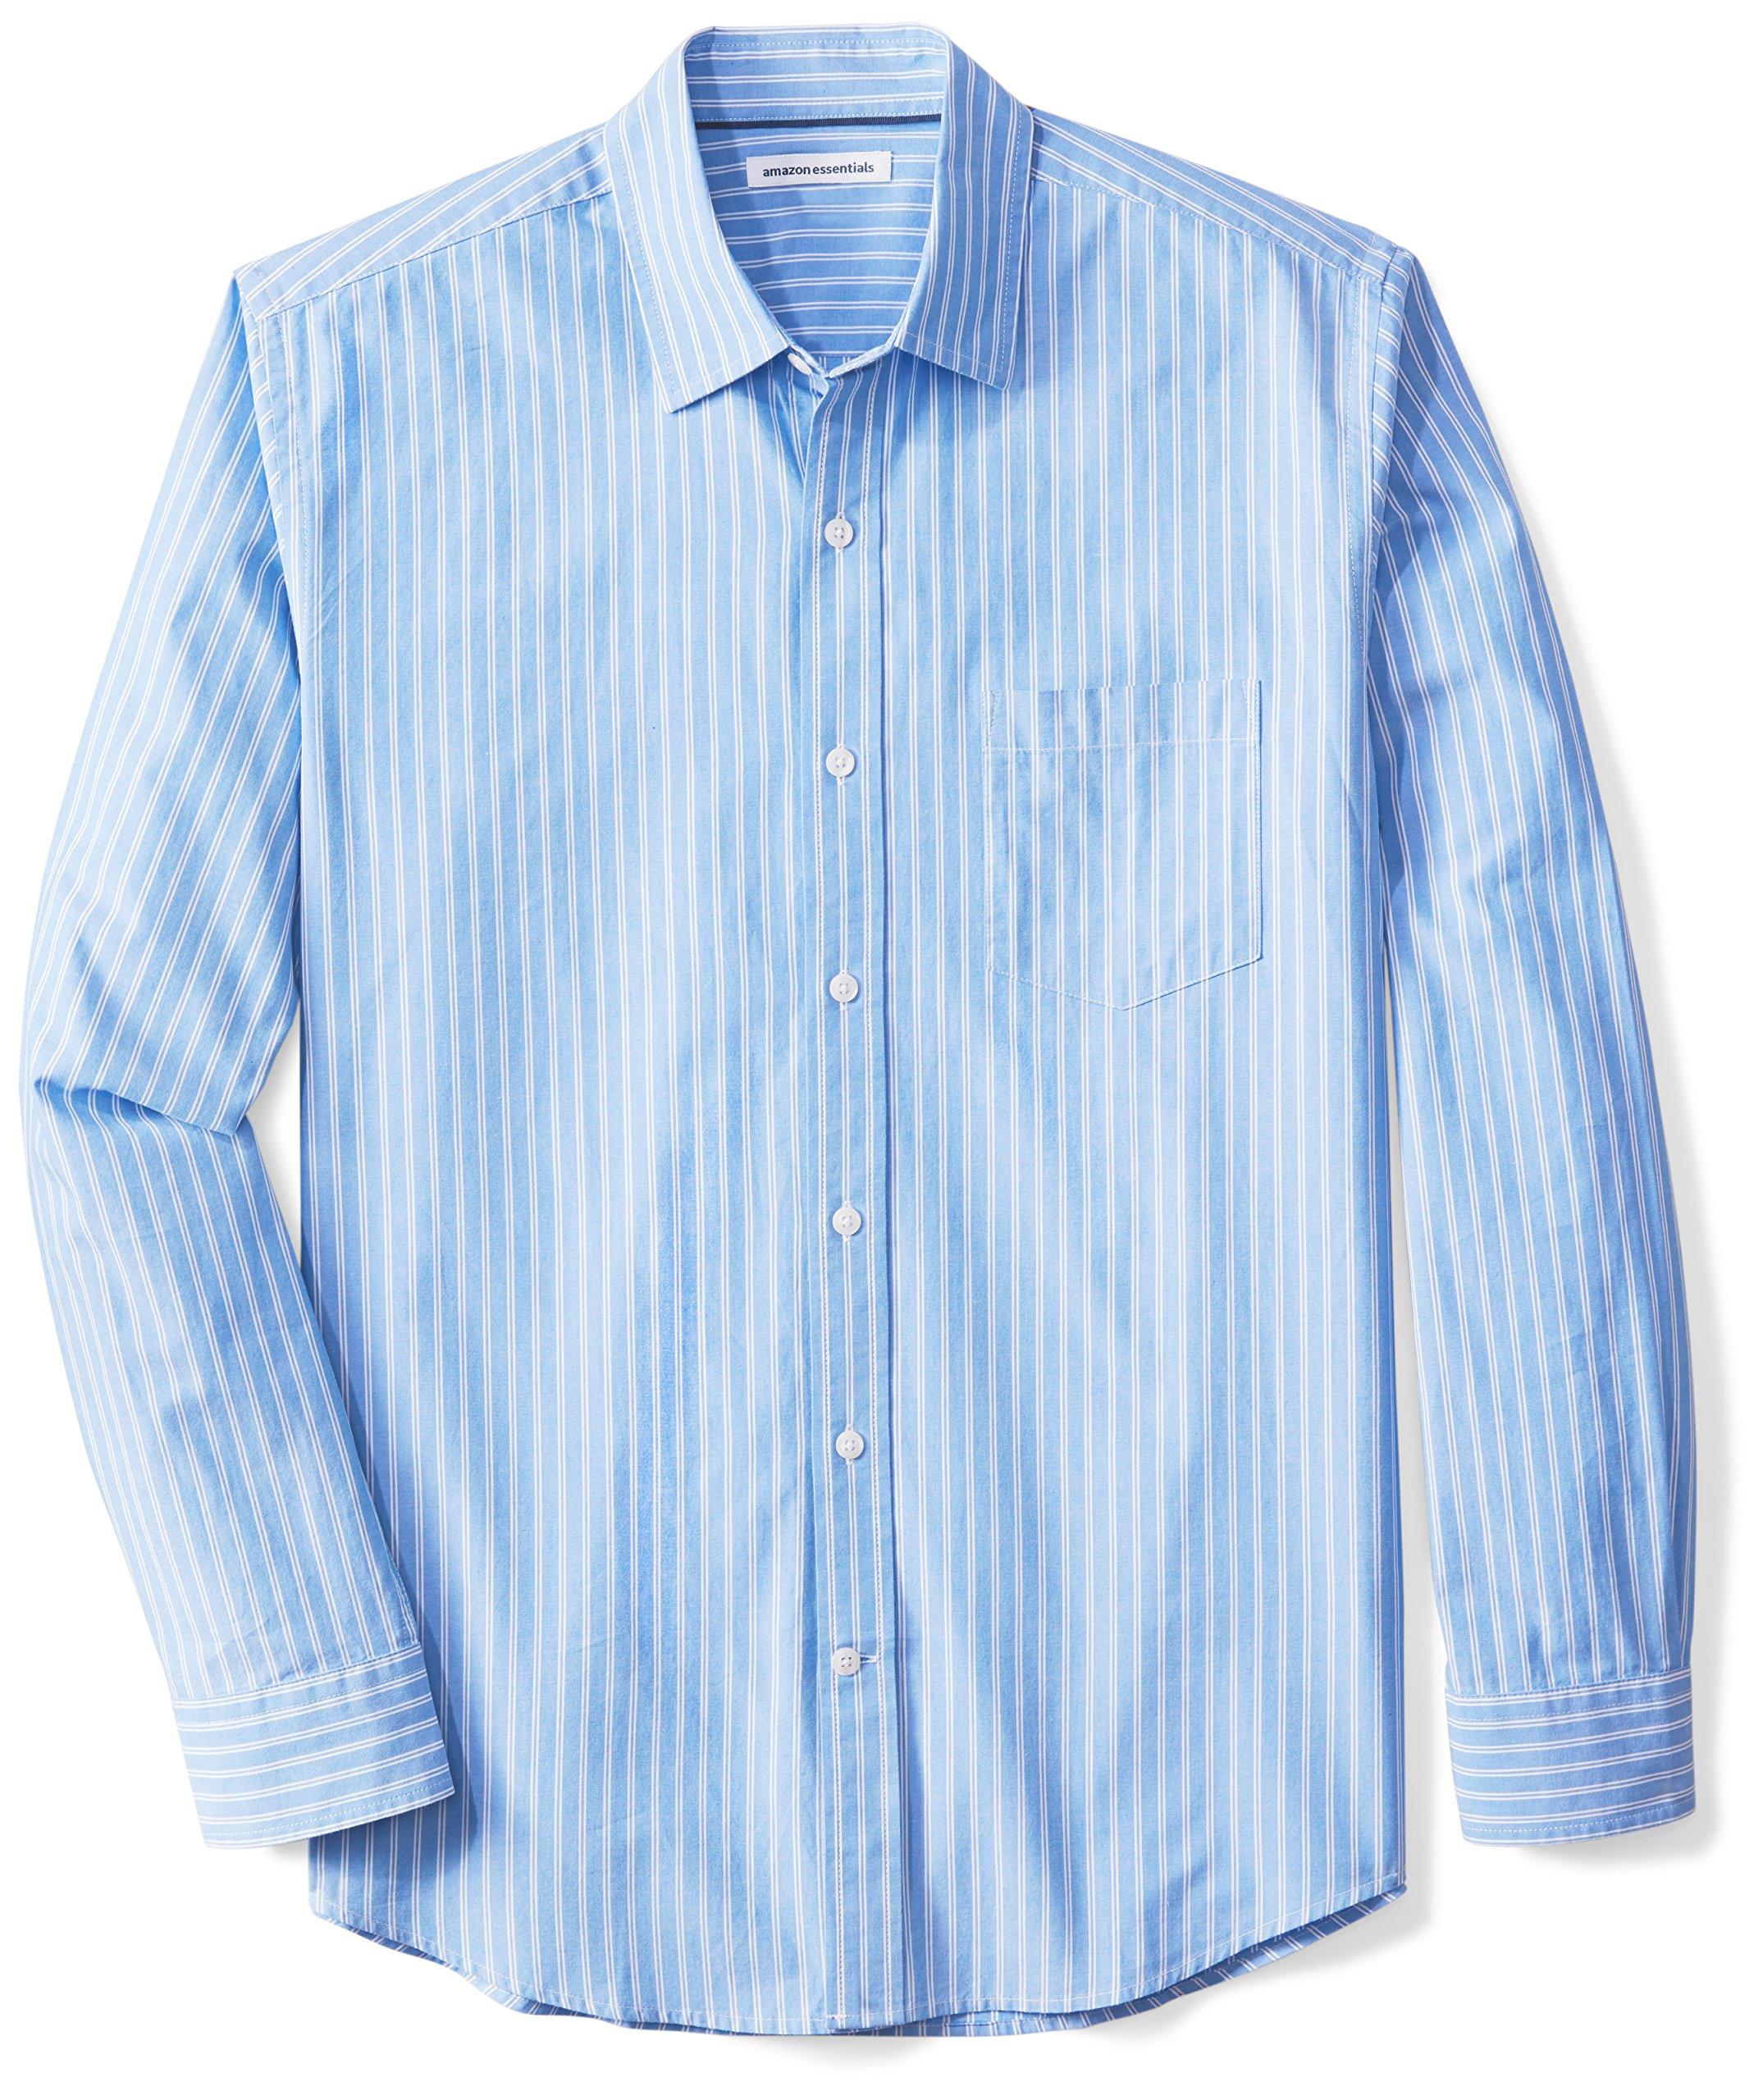 Amazon Essentials Men's Long-Sleeve Reverse Stripe Shirt, Blue/White Stripe, Large